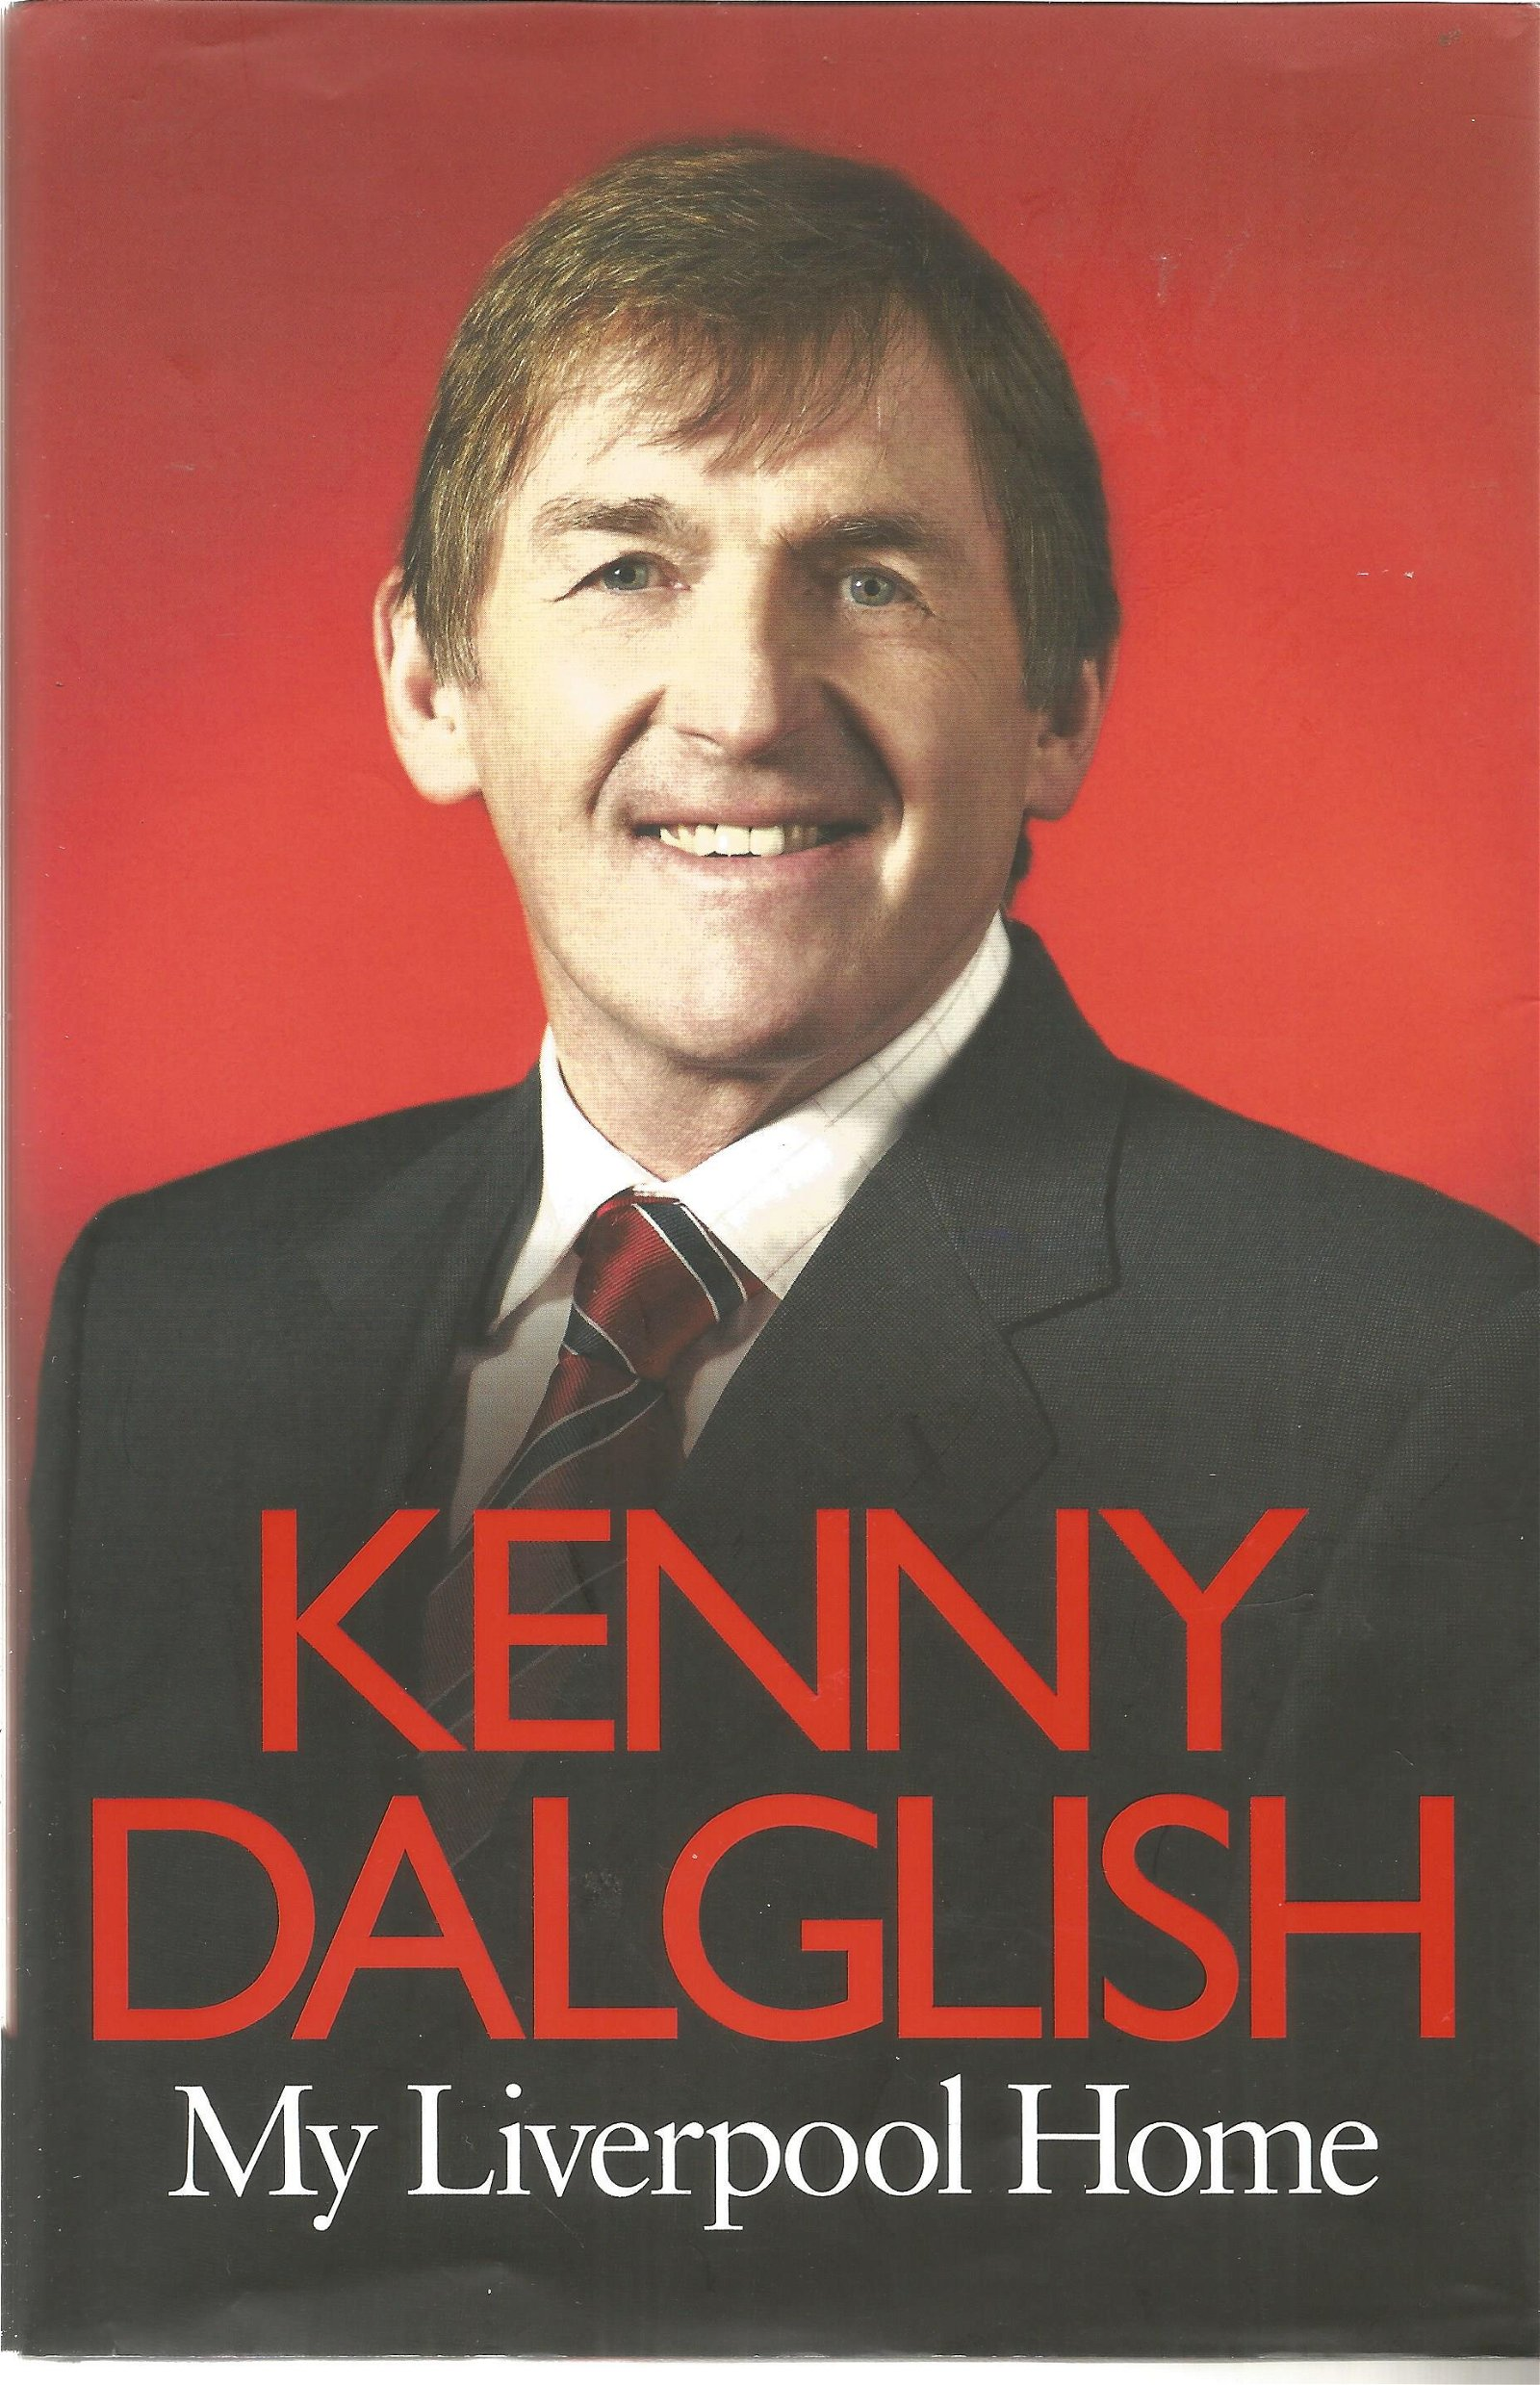 Kenny Dalglish signed My Liverpool Home hardback book,